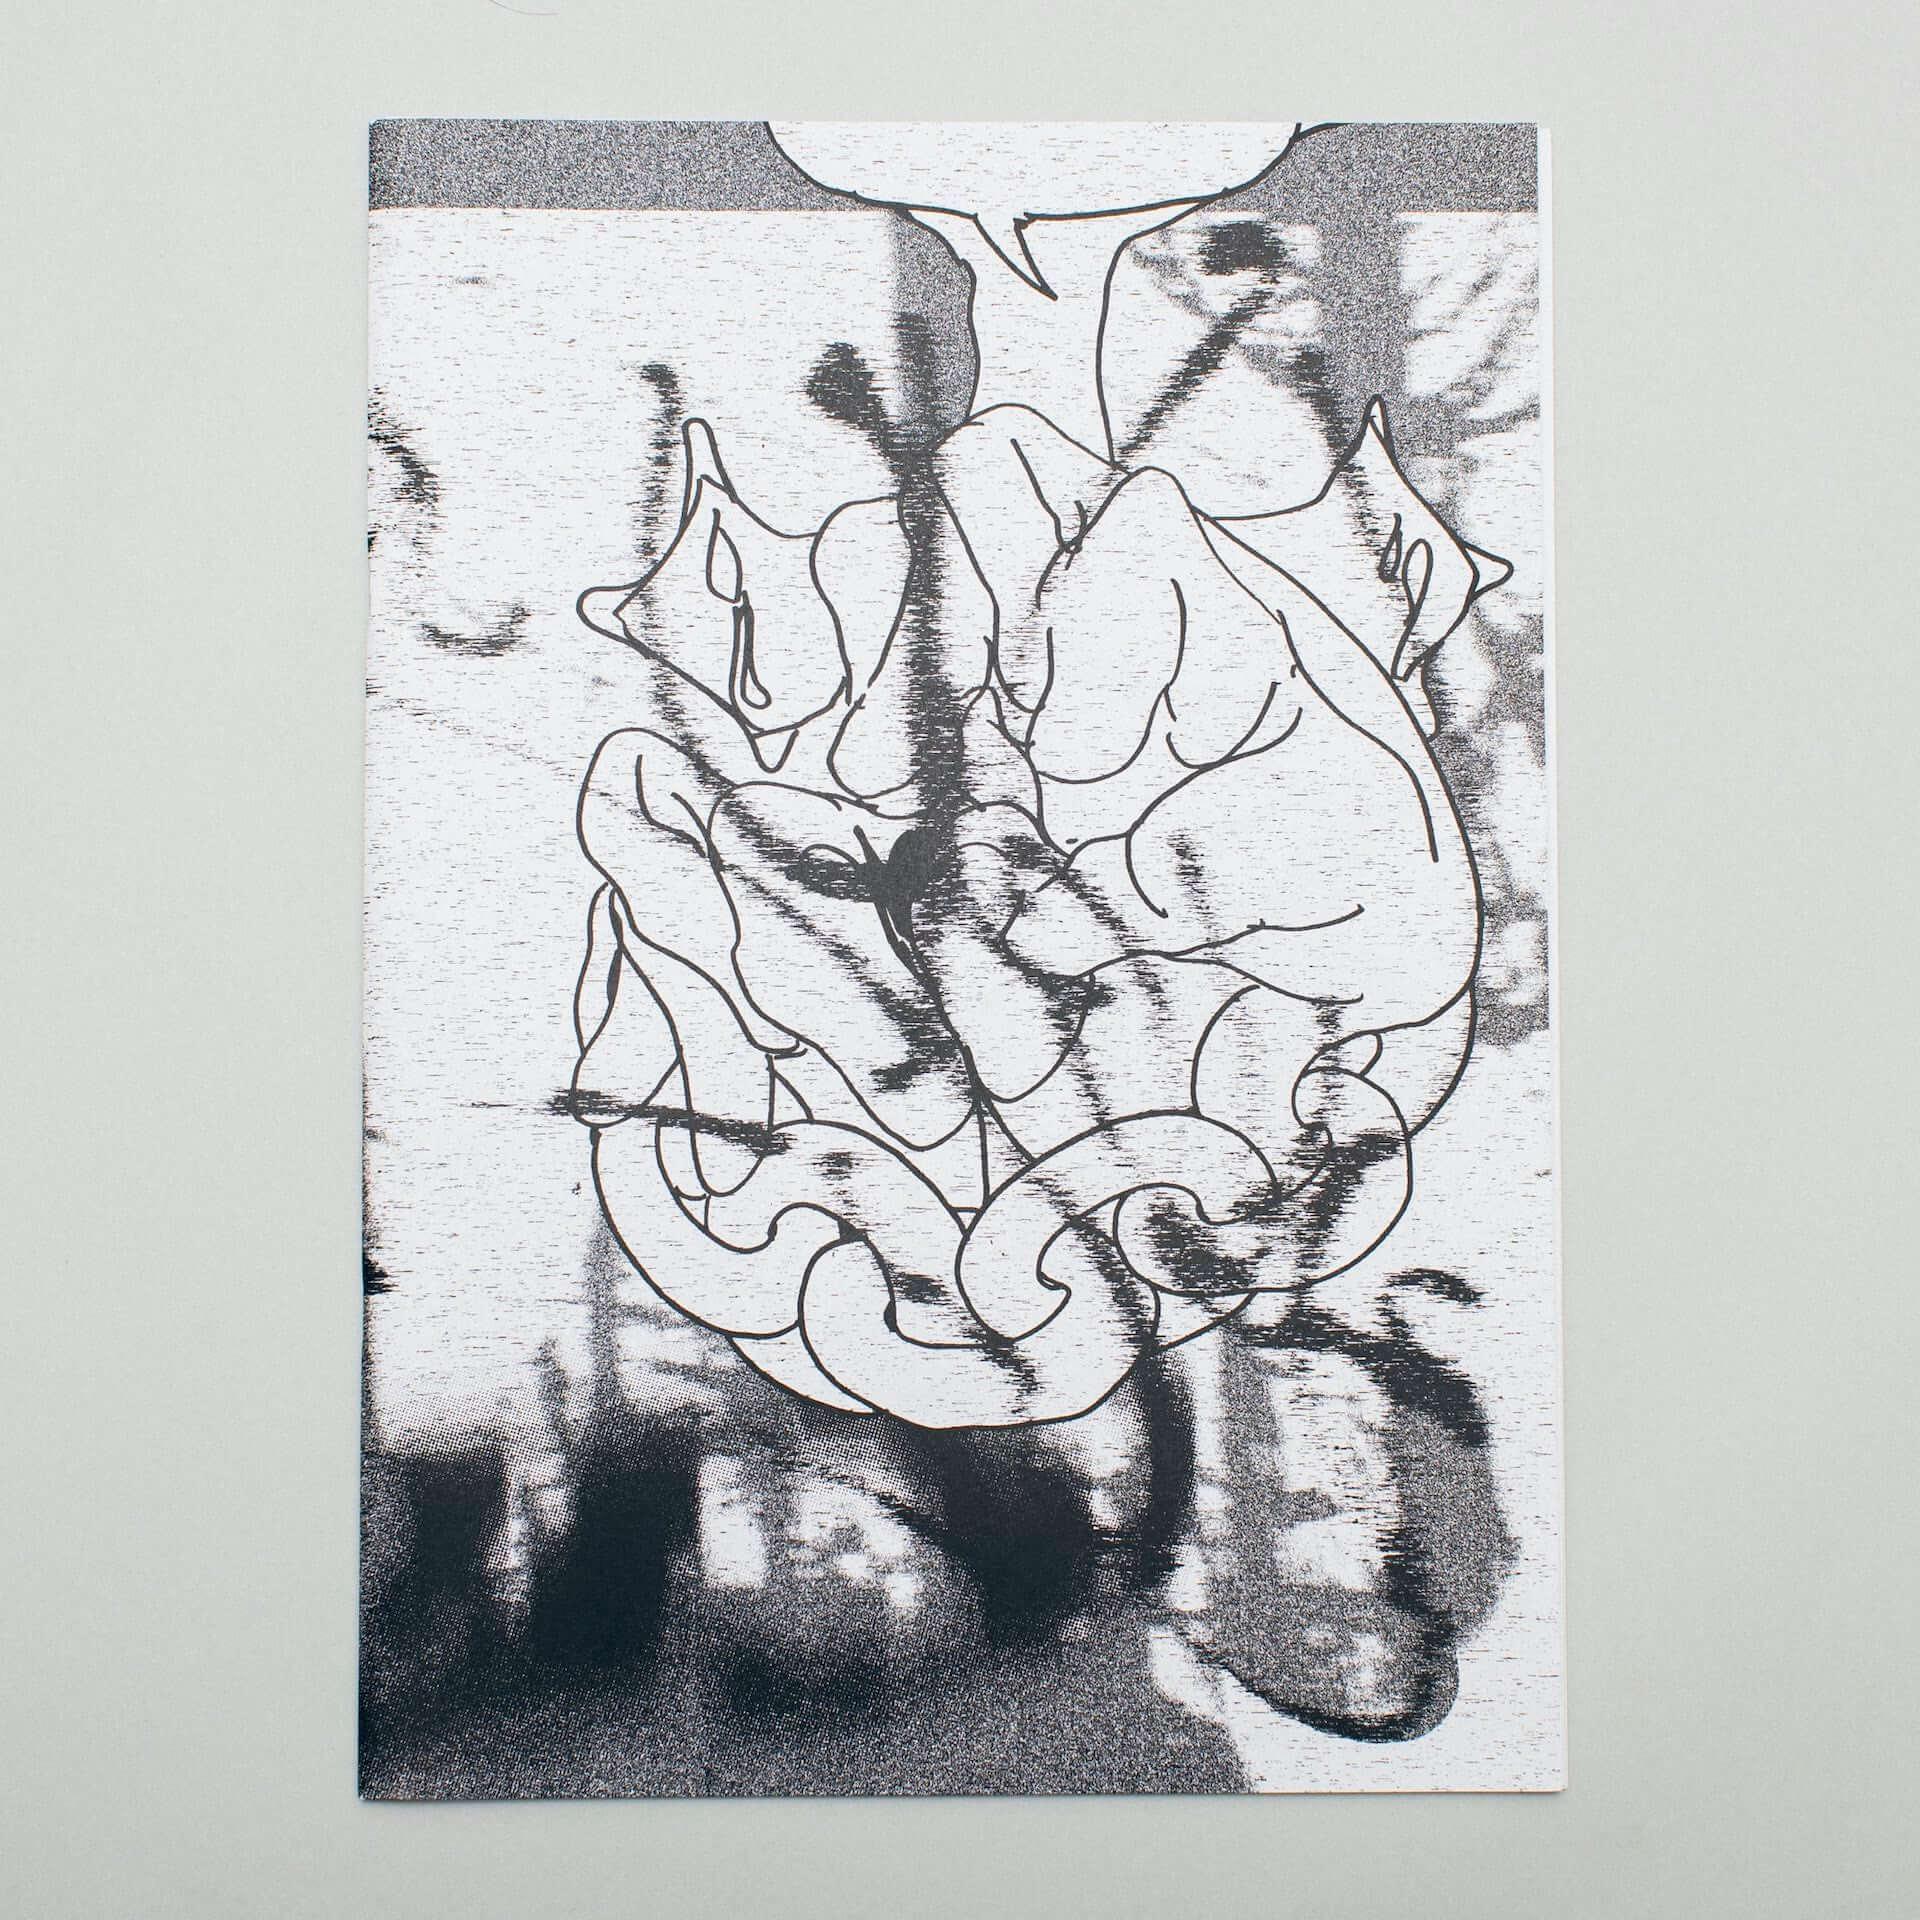 LAID BUGによる期間限定ポップアップショップが福岡の六本松 蔦屋書店「吉嗣商店」にて開催決定! art210330_laidbug_20-1920x1920